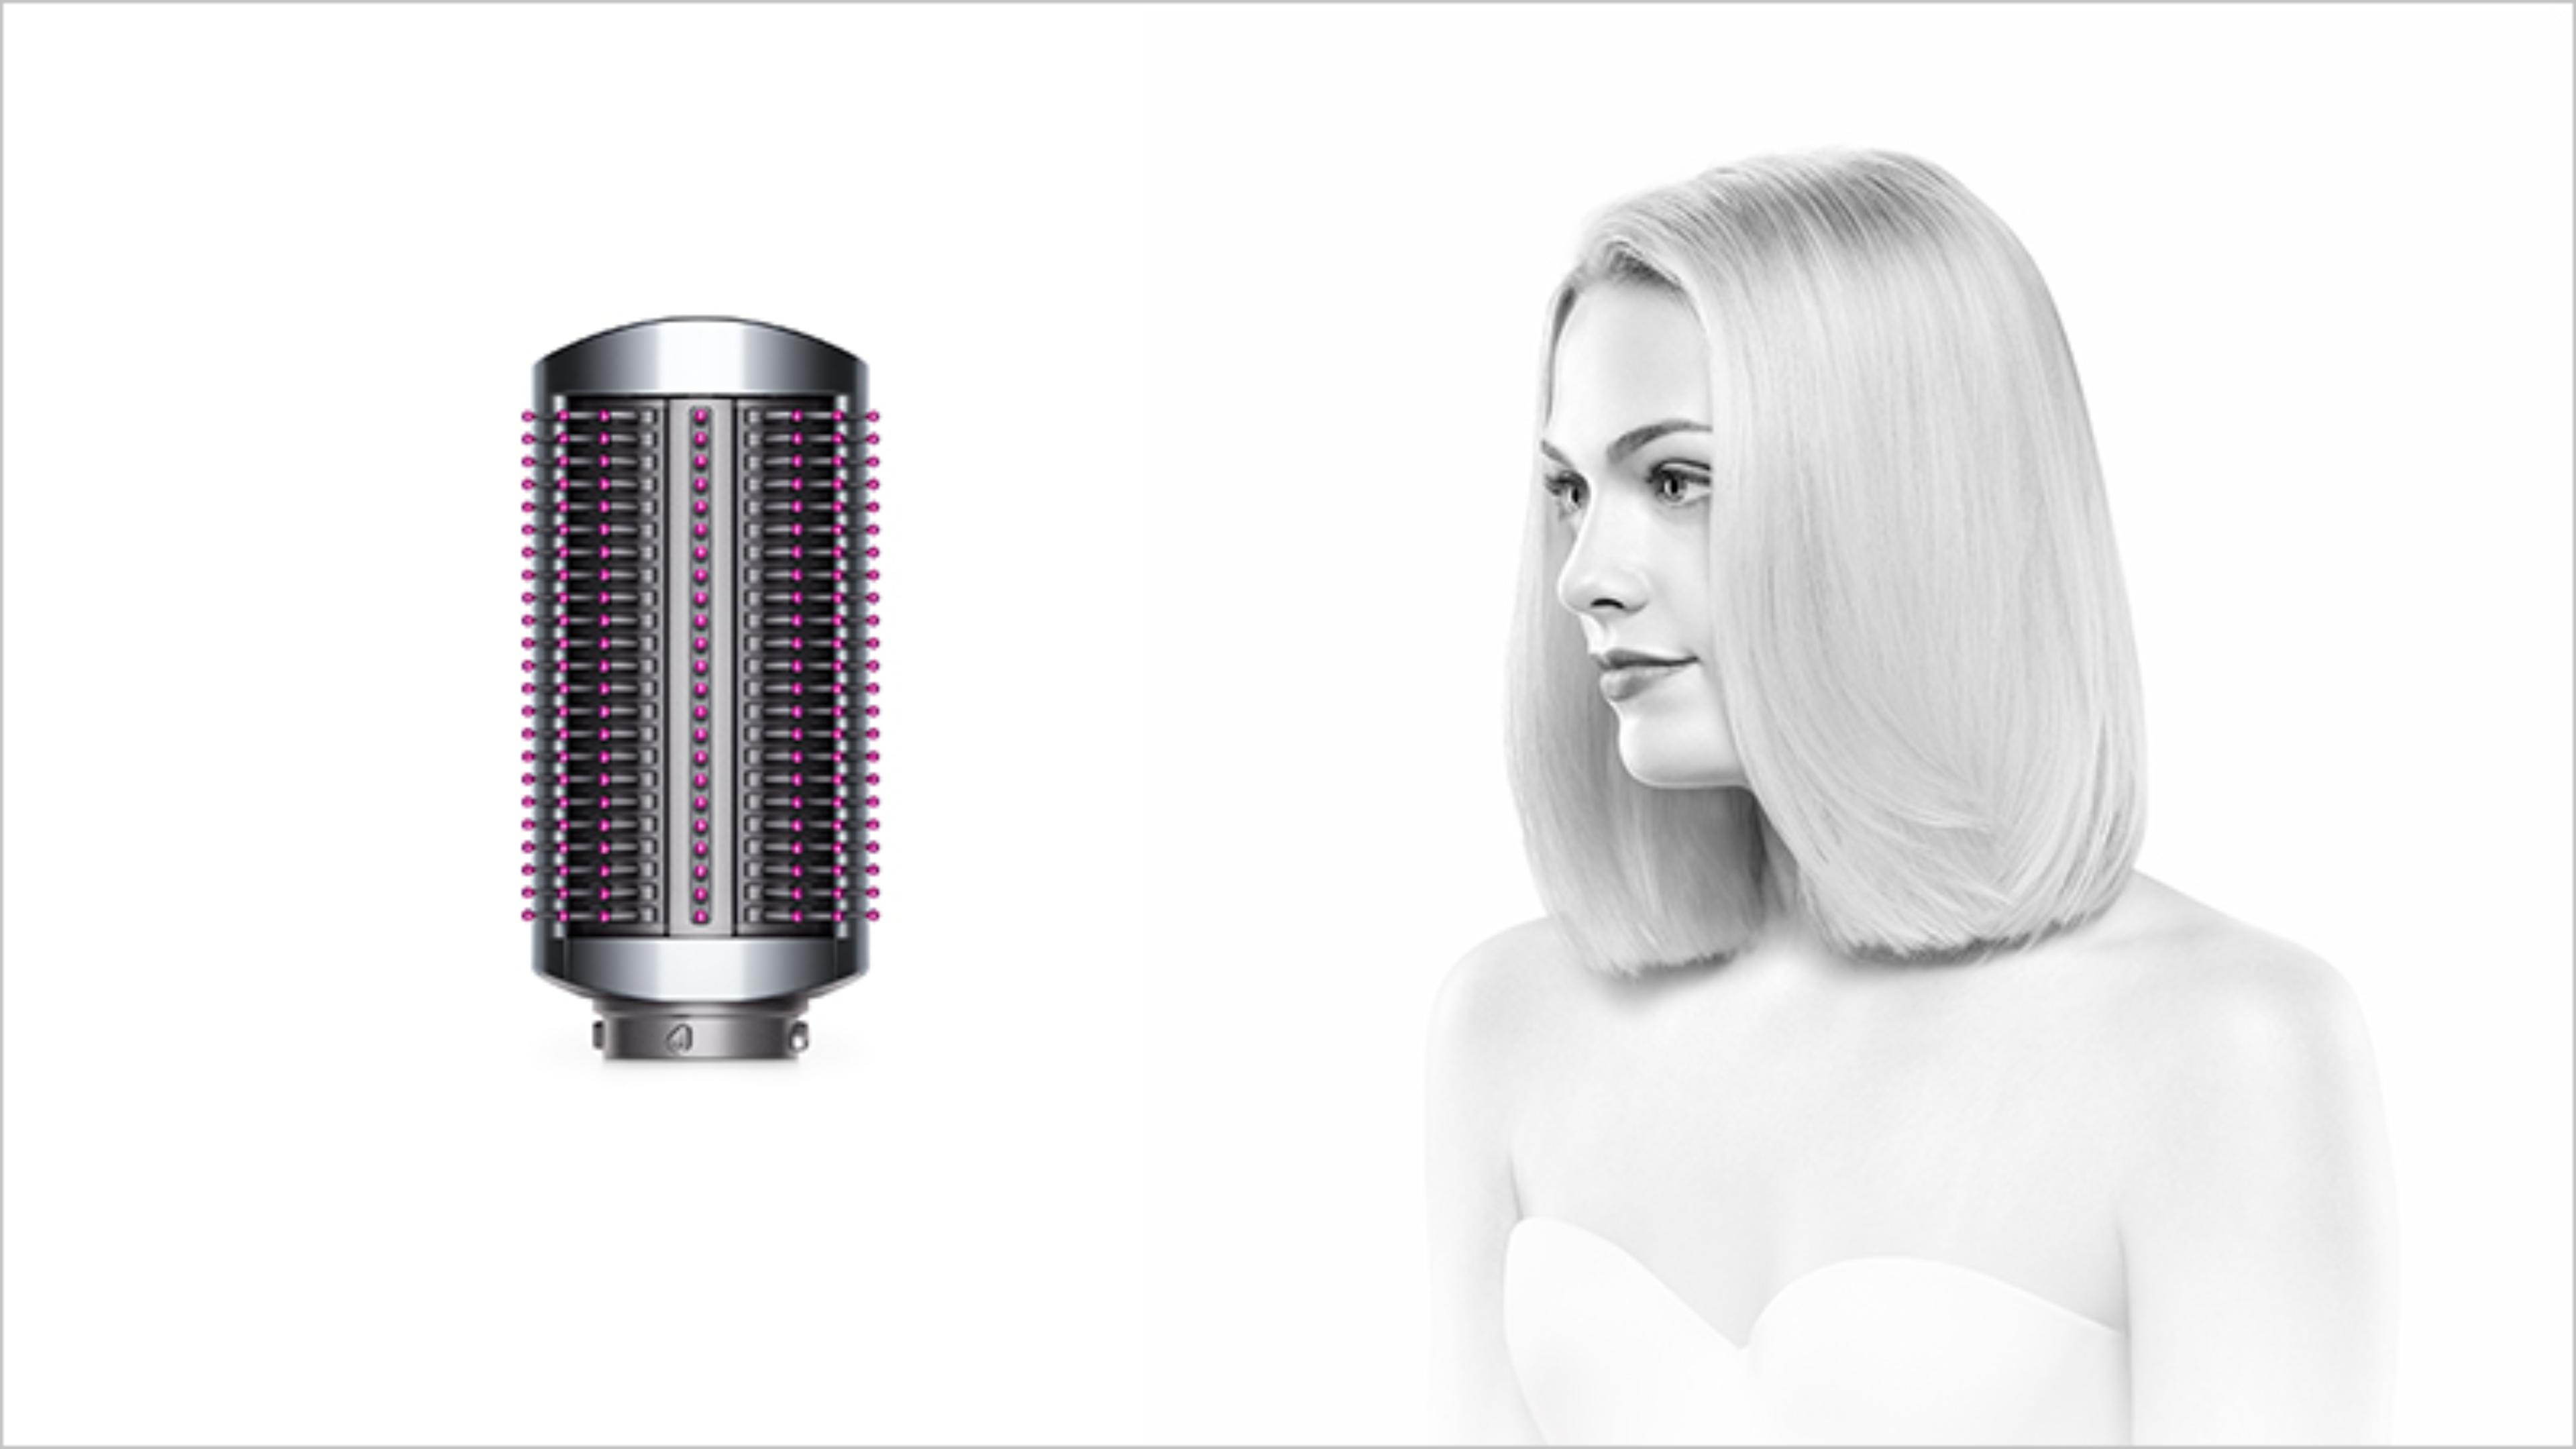 Soft smoothing brush with model using product